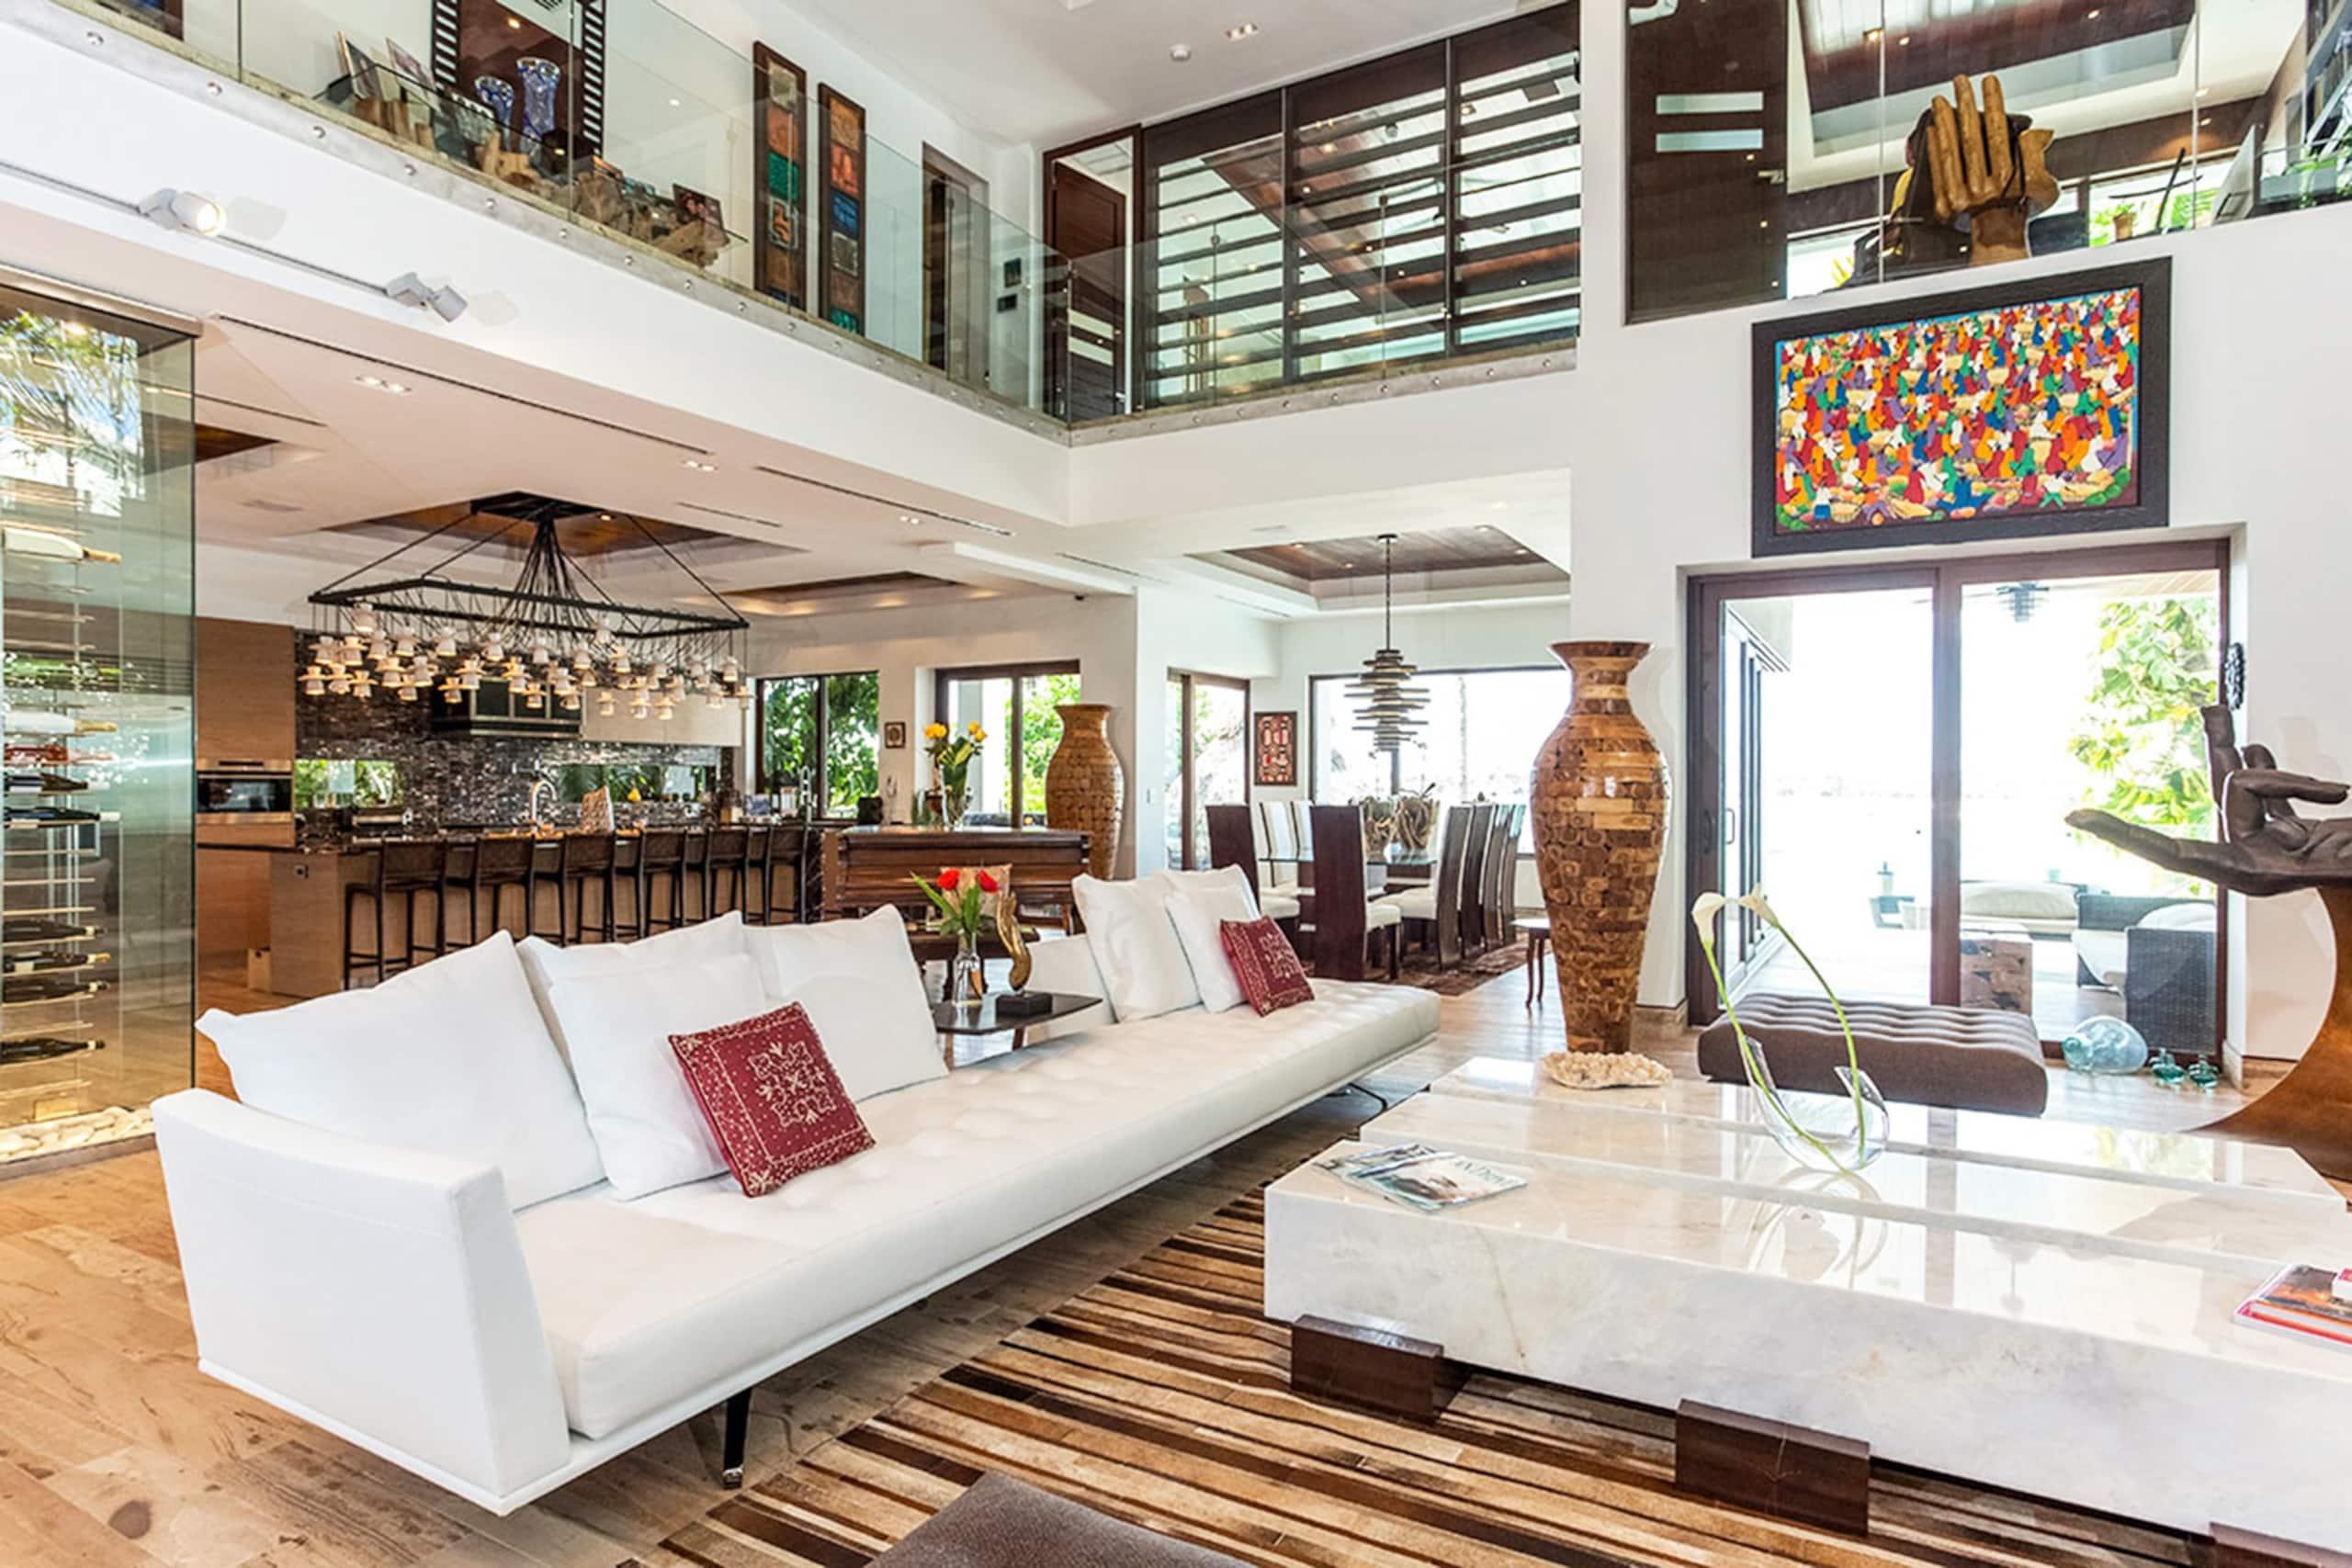 Apartment Villa Riza - Magnificent Balinese-style photo 20358804